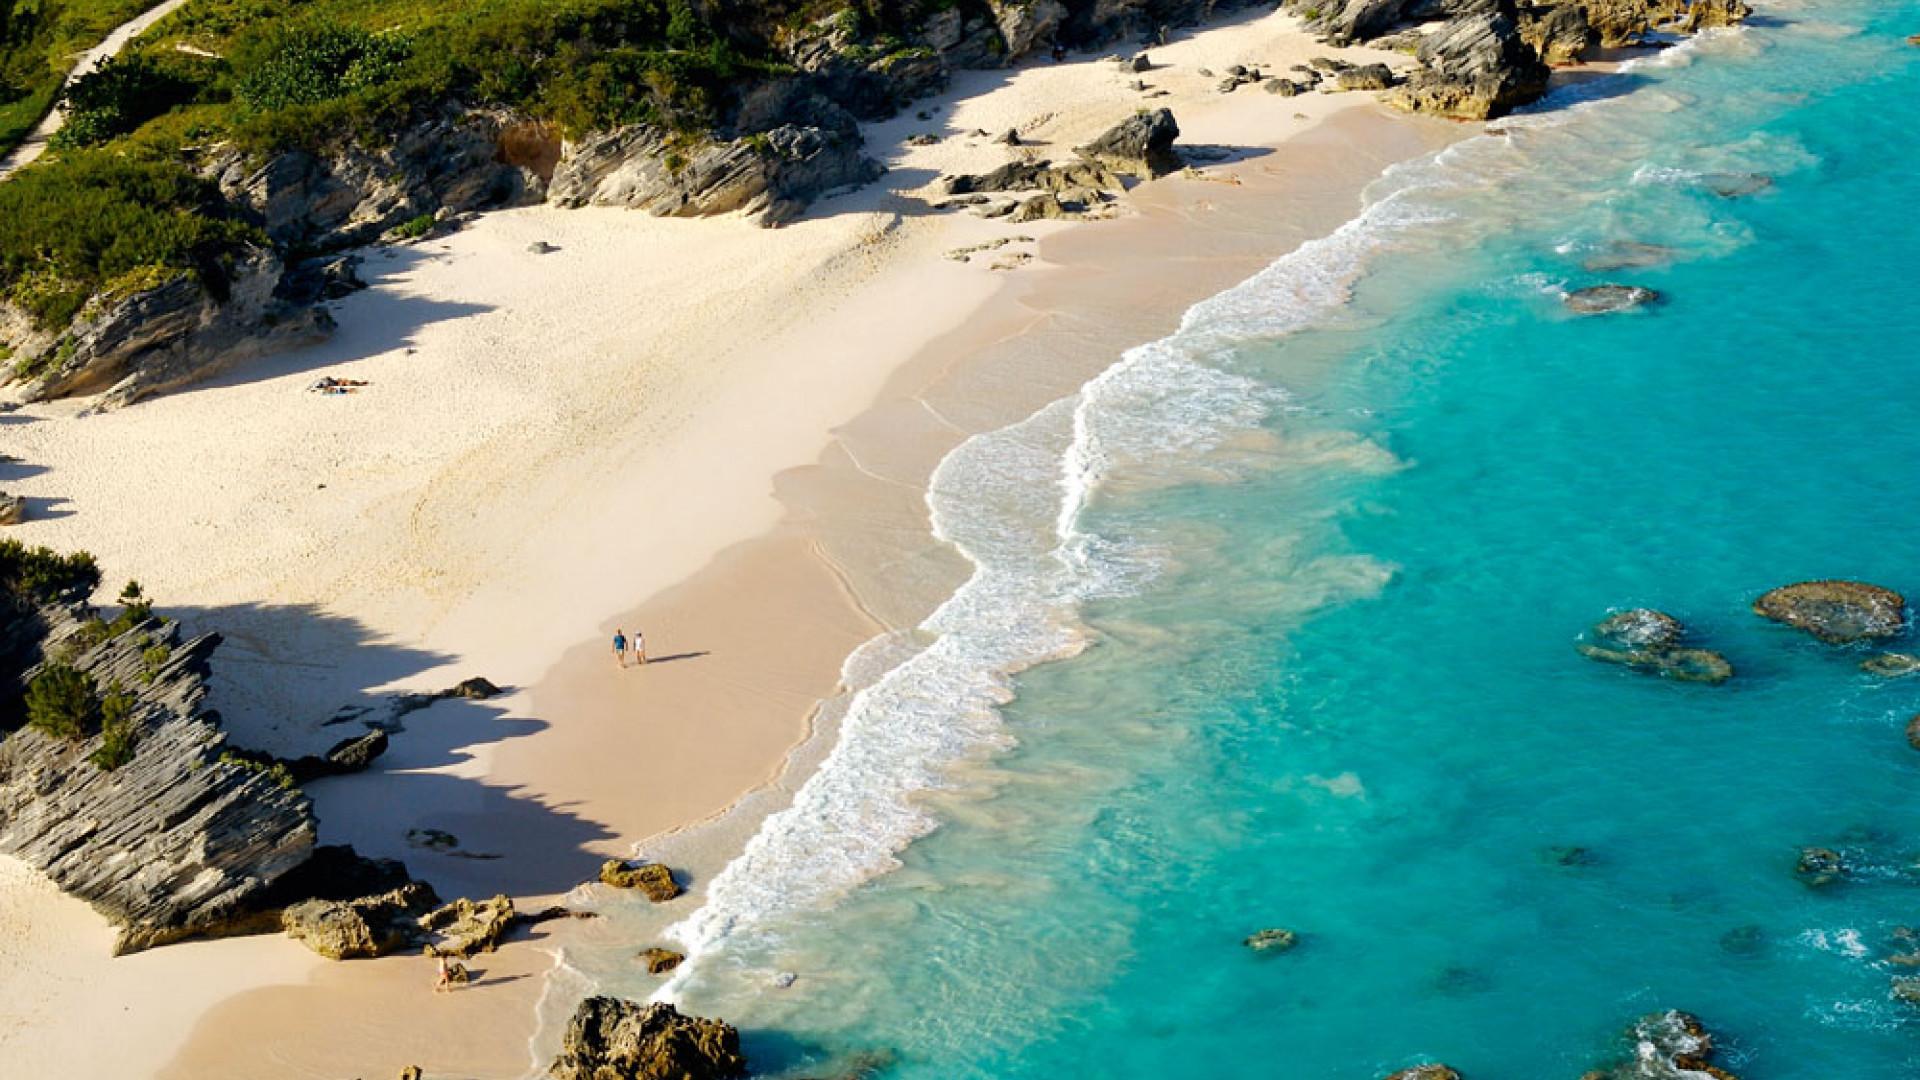 Aerial view of a beach in Bermuda